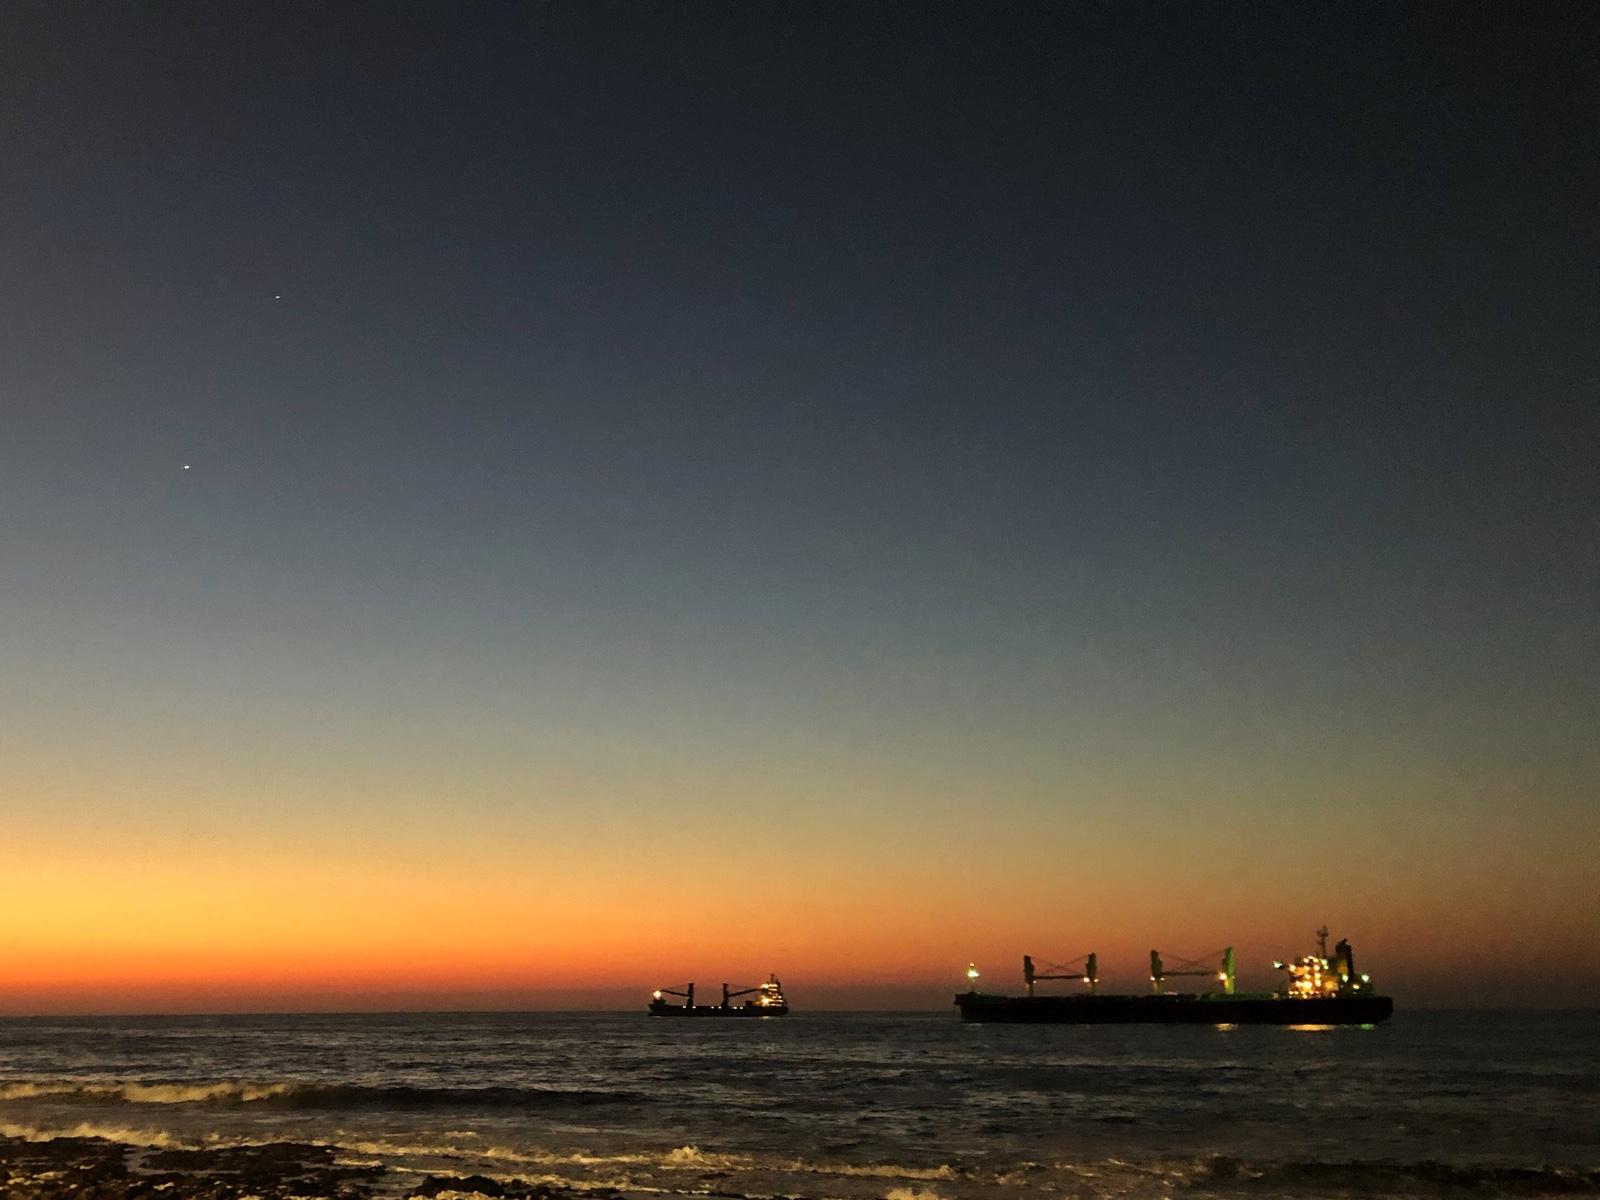 Sonnenuntergang in Antofagasta